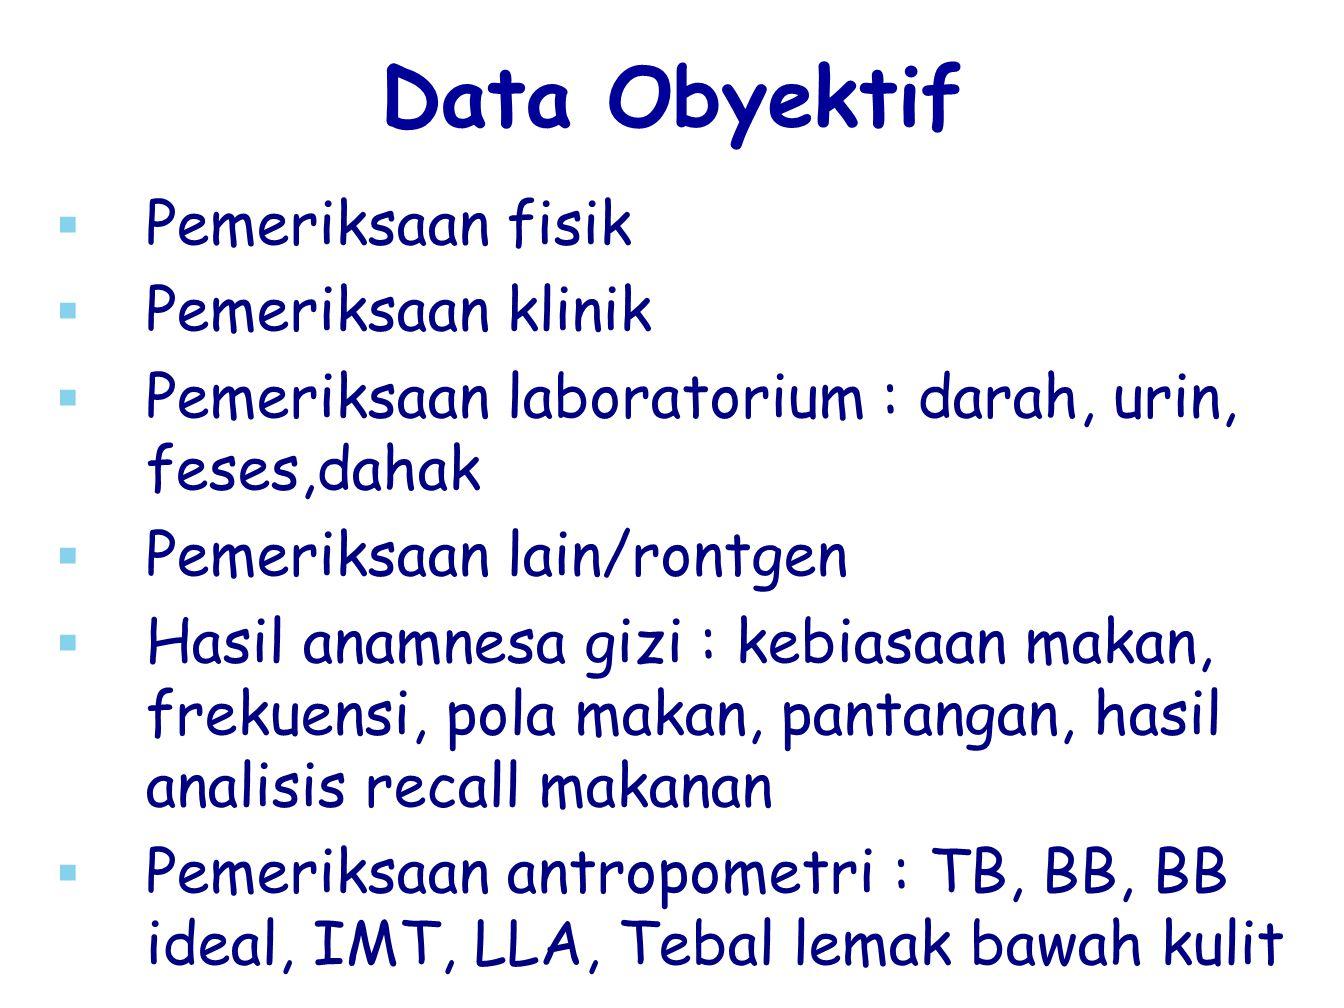 Data Obyektif Pemeriksaan fisik Pemeriksaan klinik